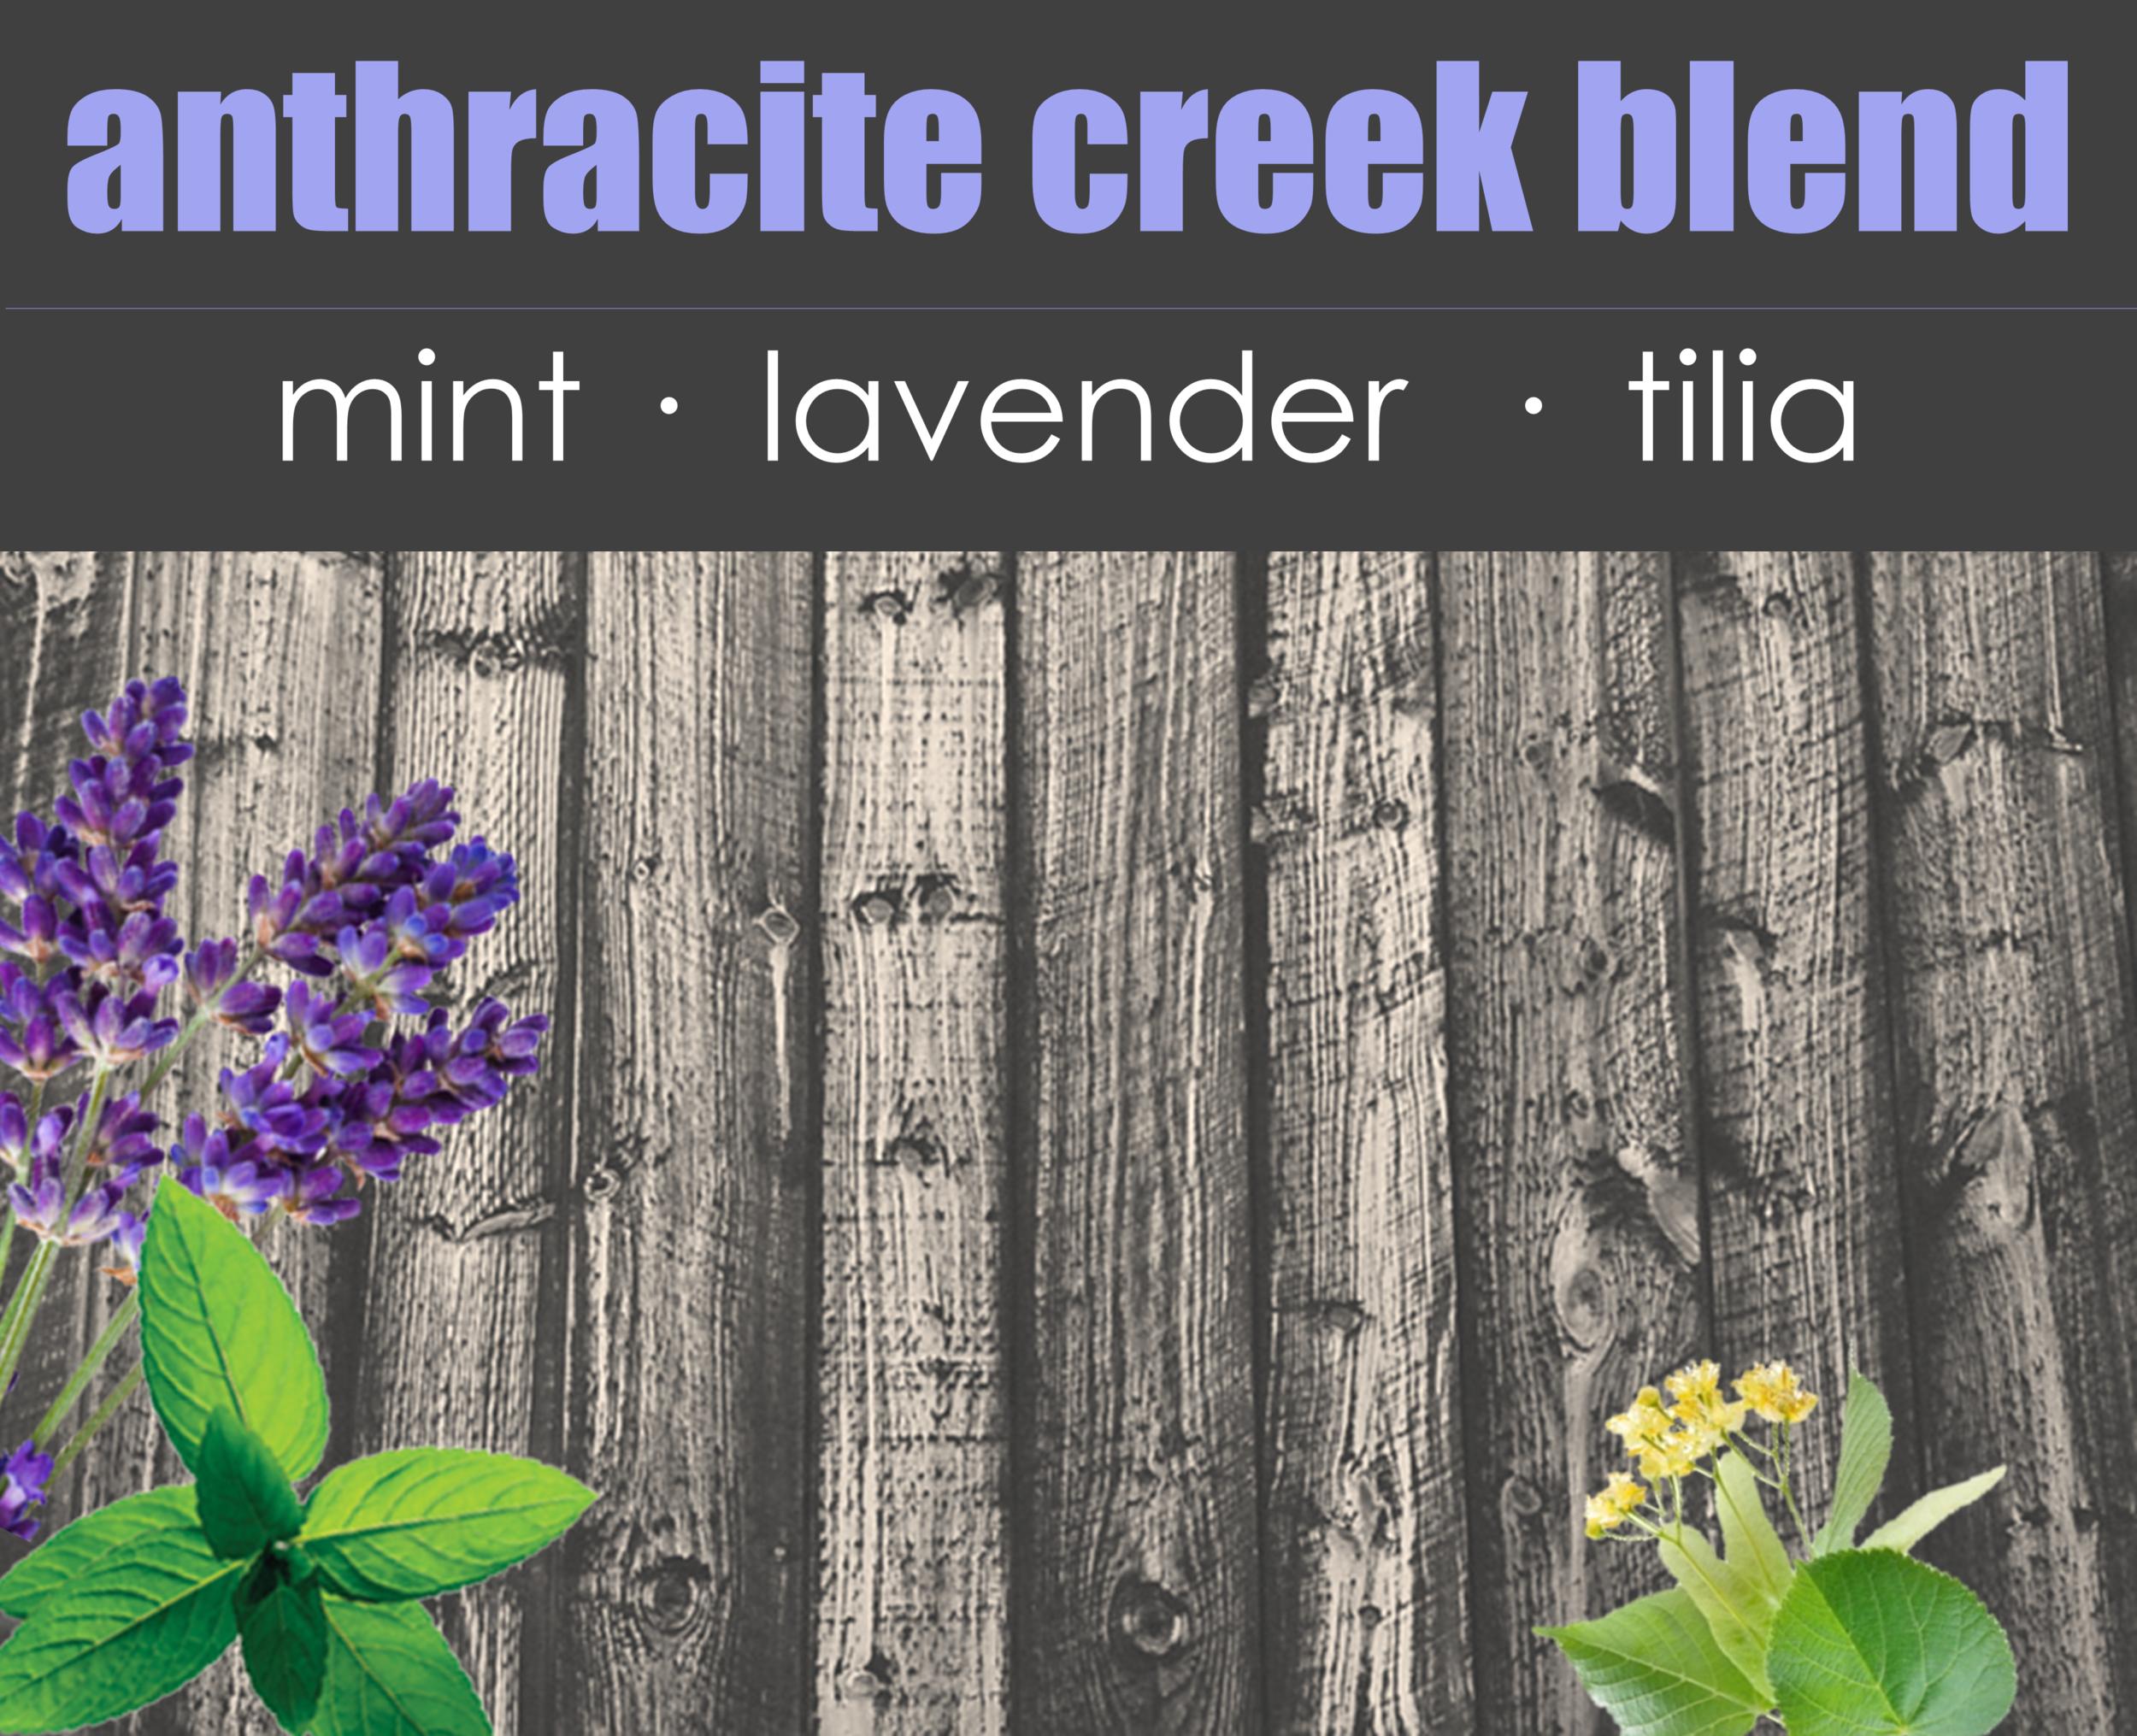 Anthracite Creek Blend